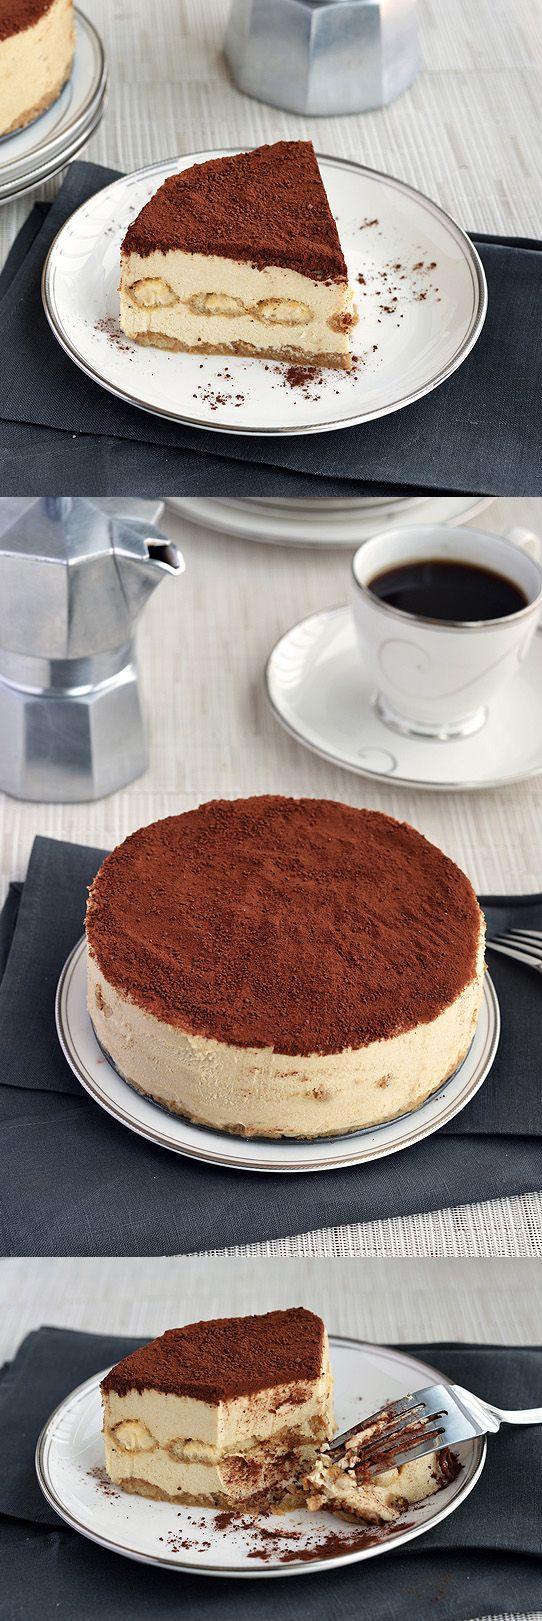 tiramisu-cheesecake-pecados-paleo-reposteria